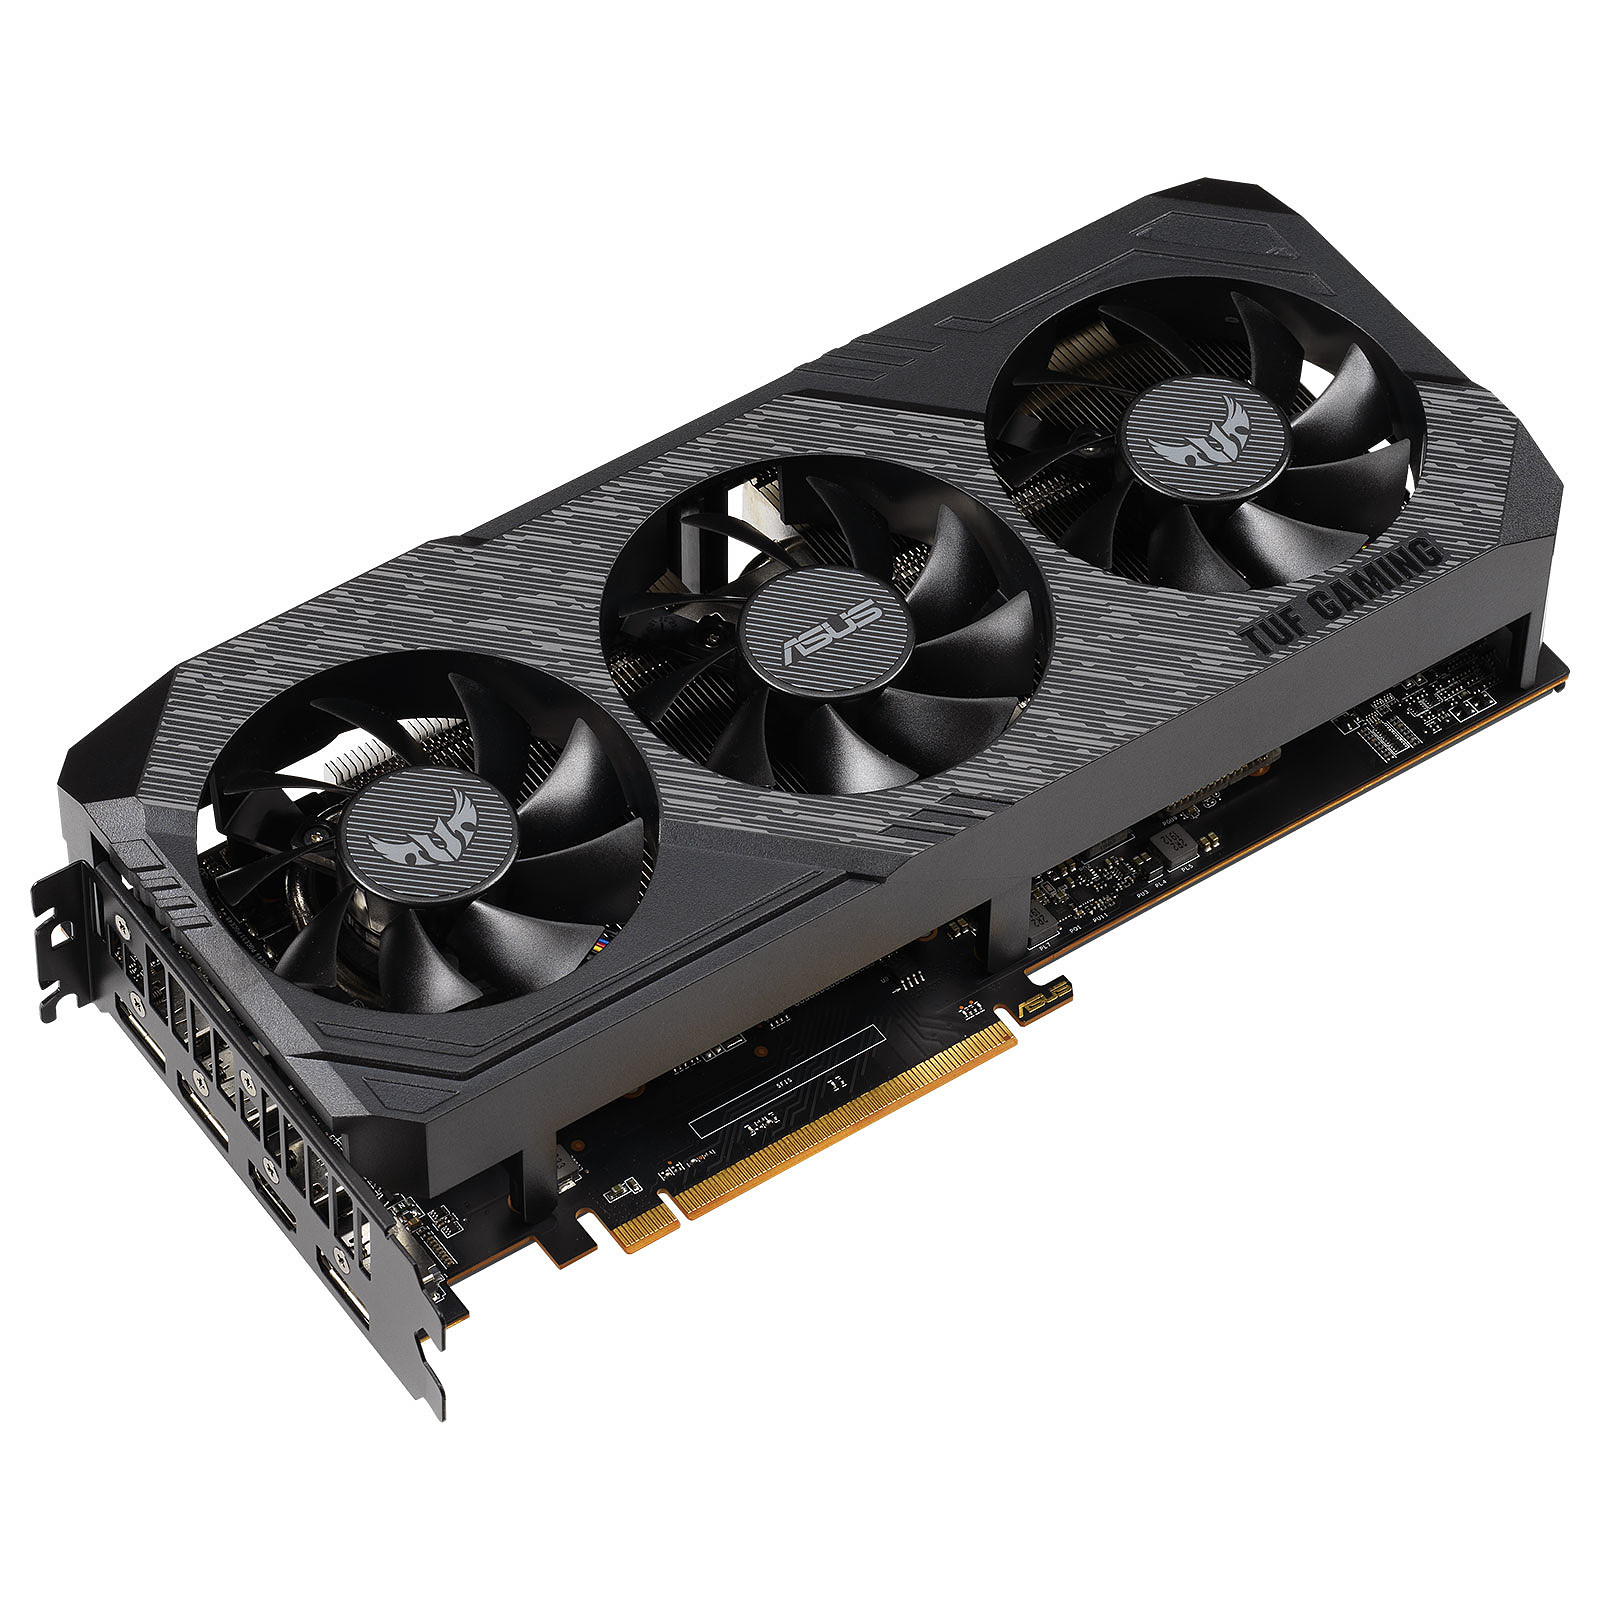 ASUS Radeon RX 5700 TUF 3-RX5700-O8G-GAMING